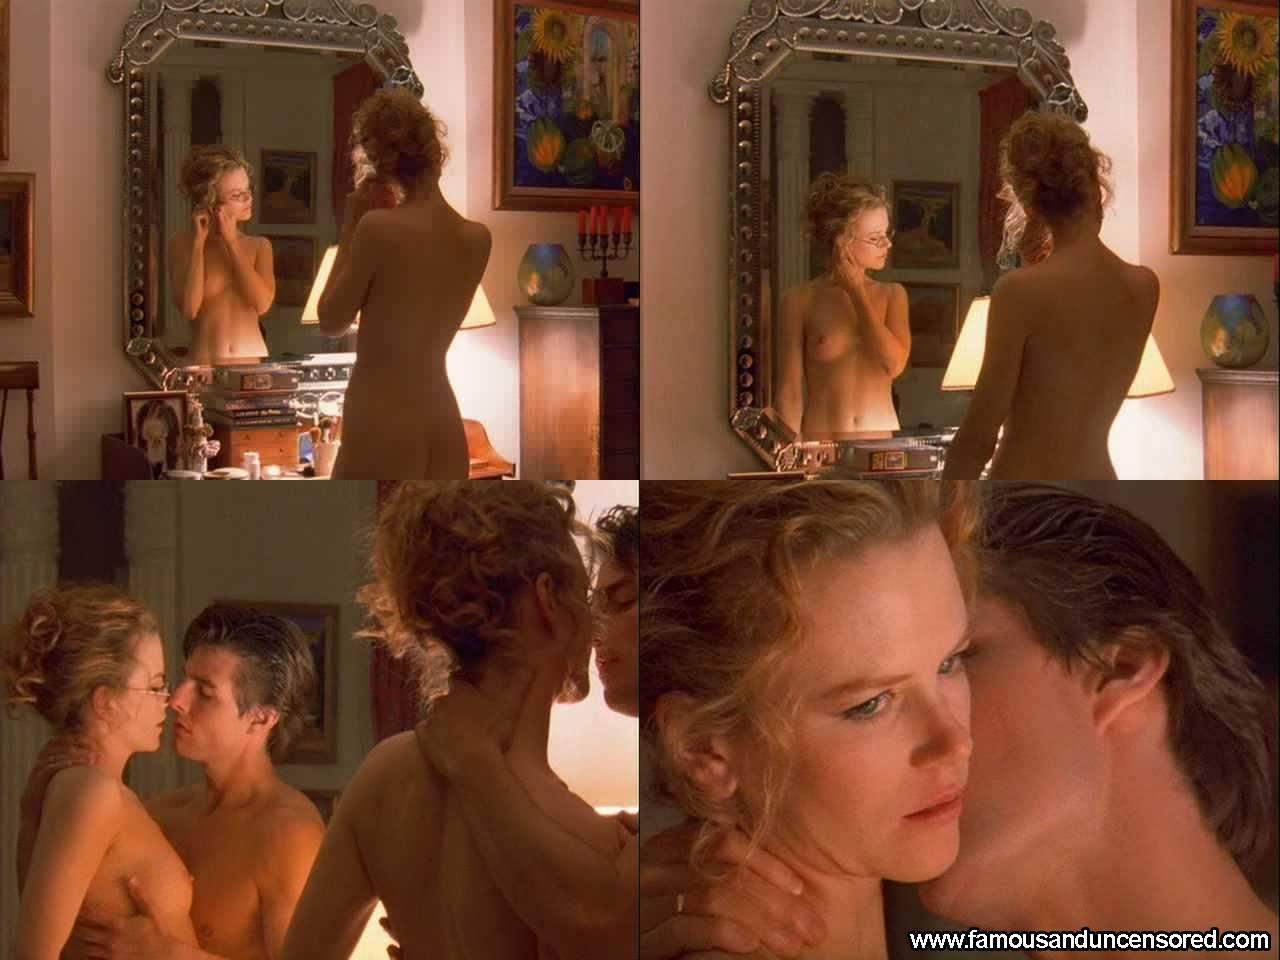 Nicole Kidman Nude Sexy Scene in Eyes Wide Shut Celebrity Photos and ...: www.famousanduncensored.com/nitrovideo.com/galleries/2028-nicole...